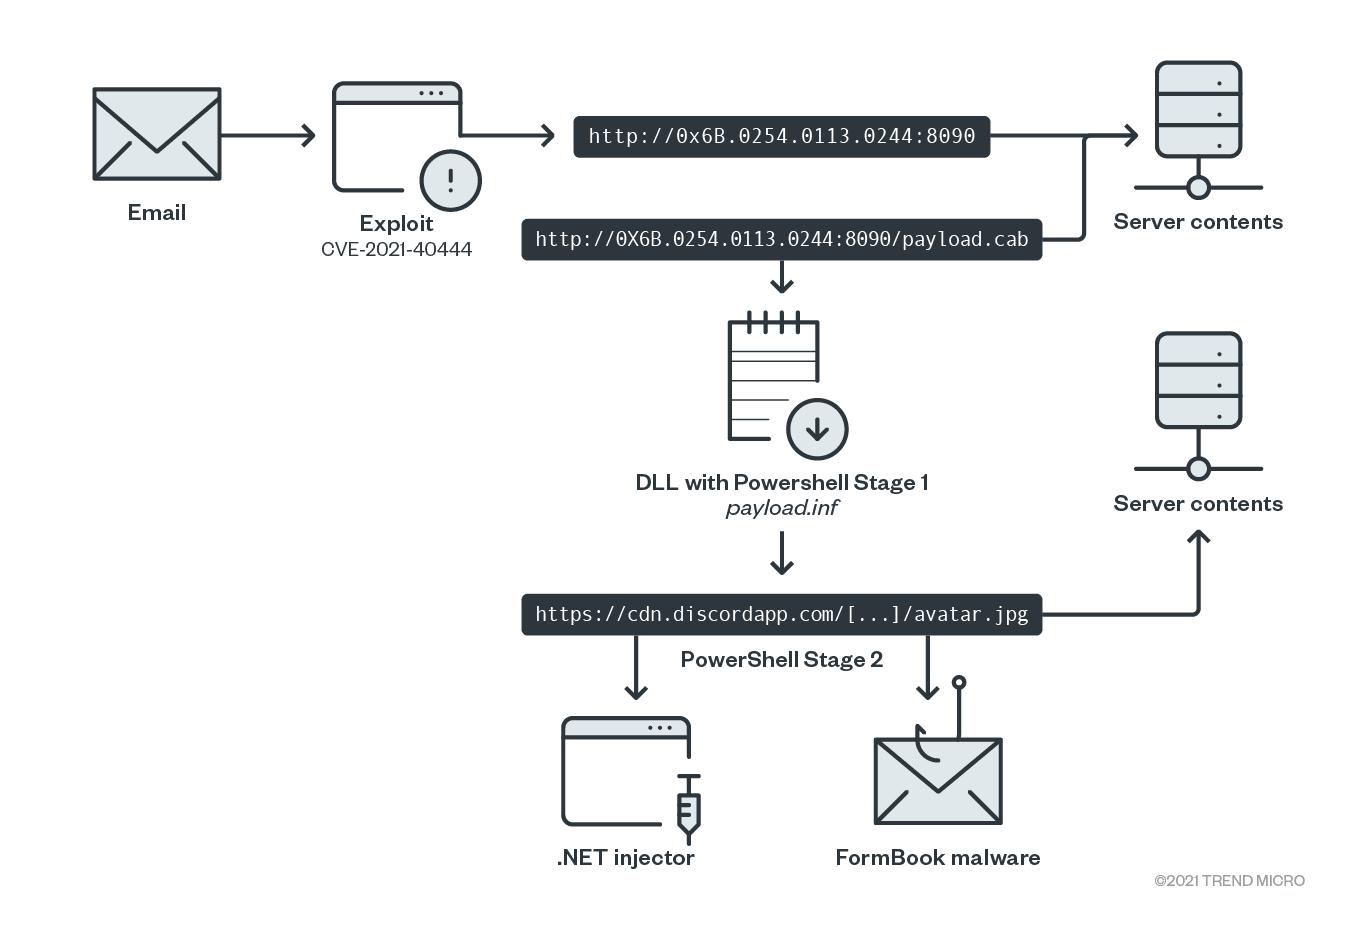 圖 6:攻擊流程示意圖。Simplified attack chain diagram